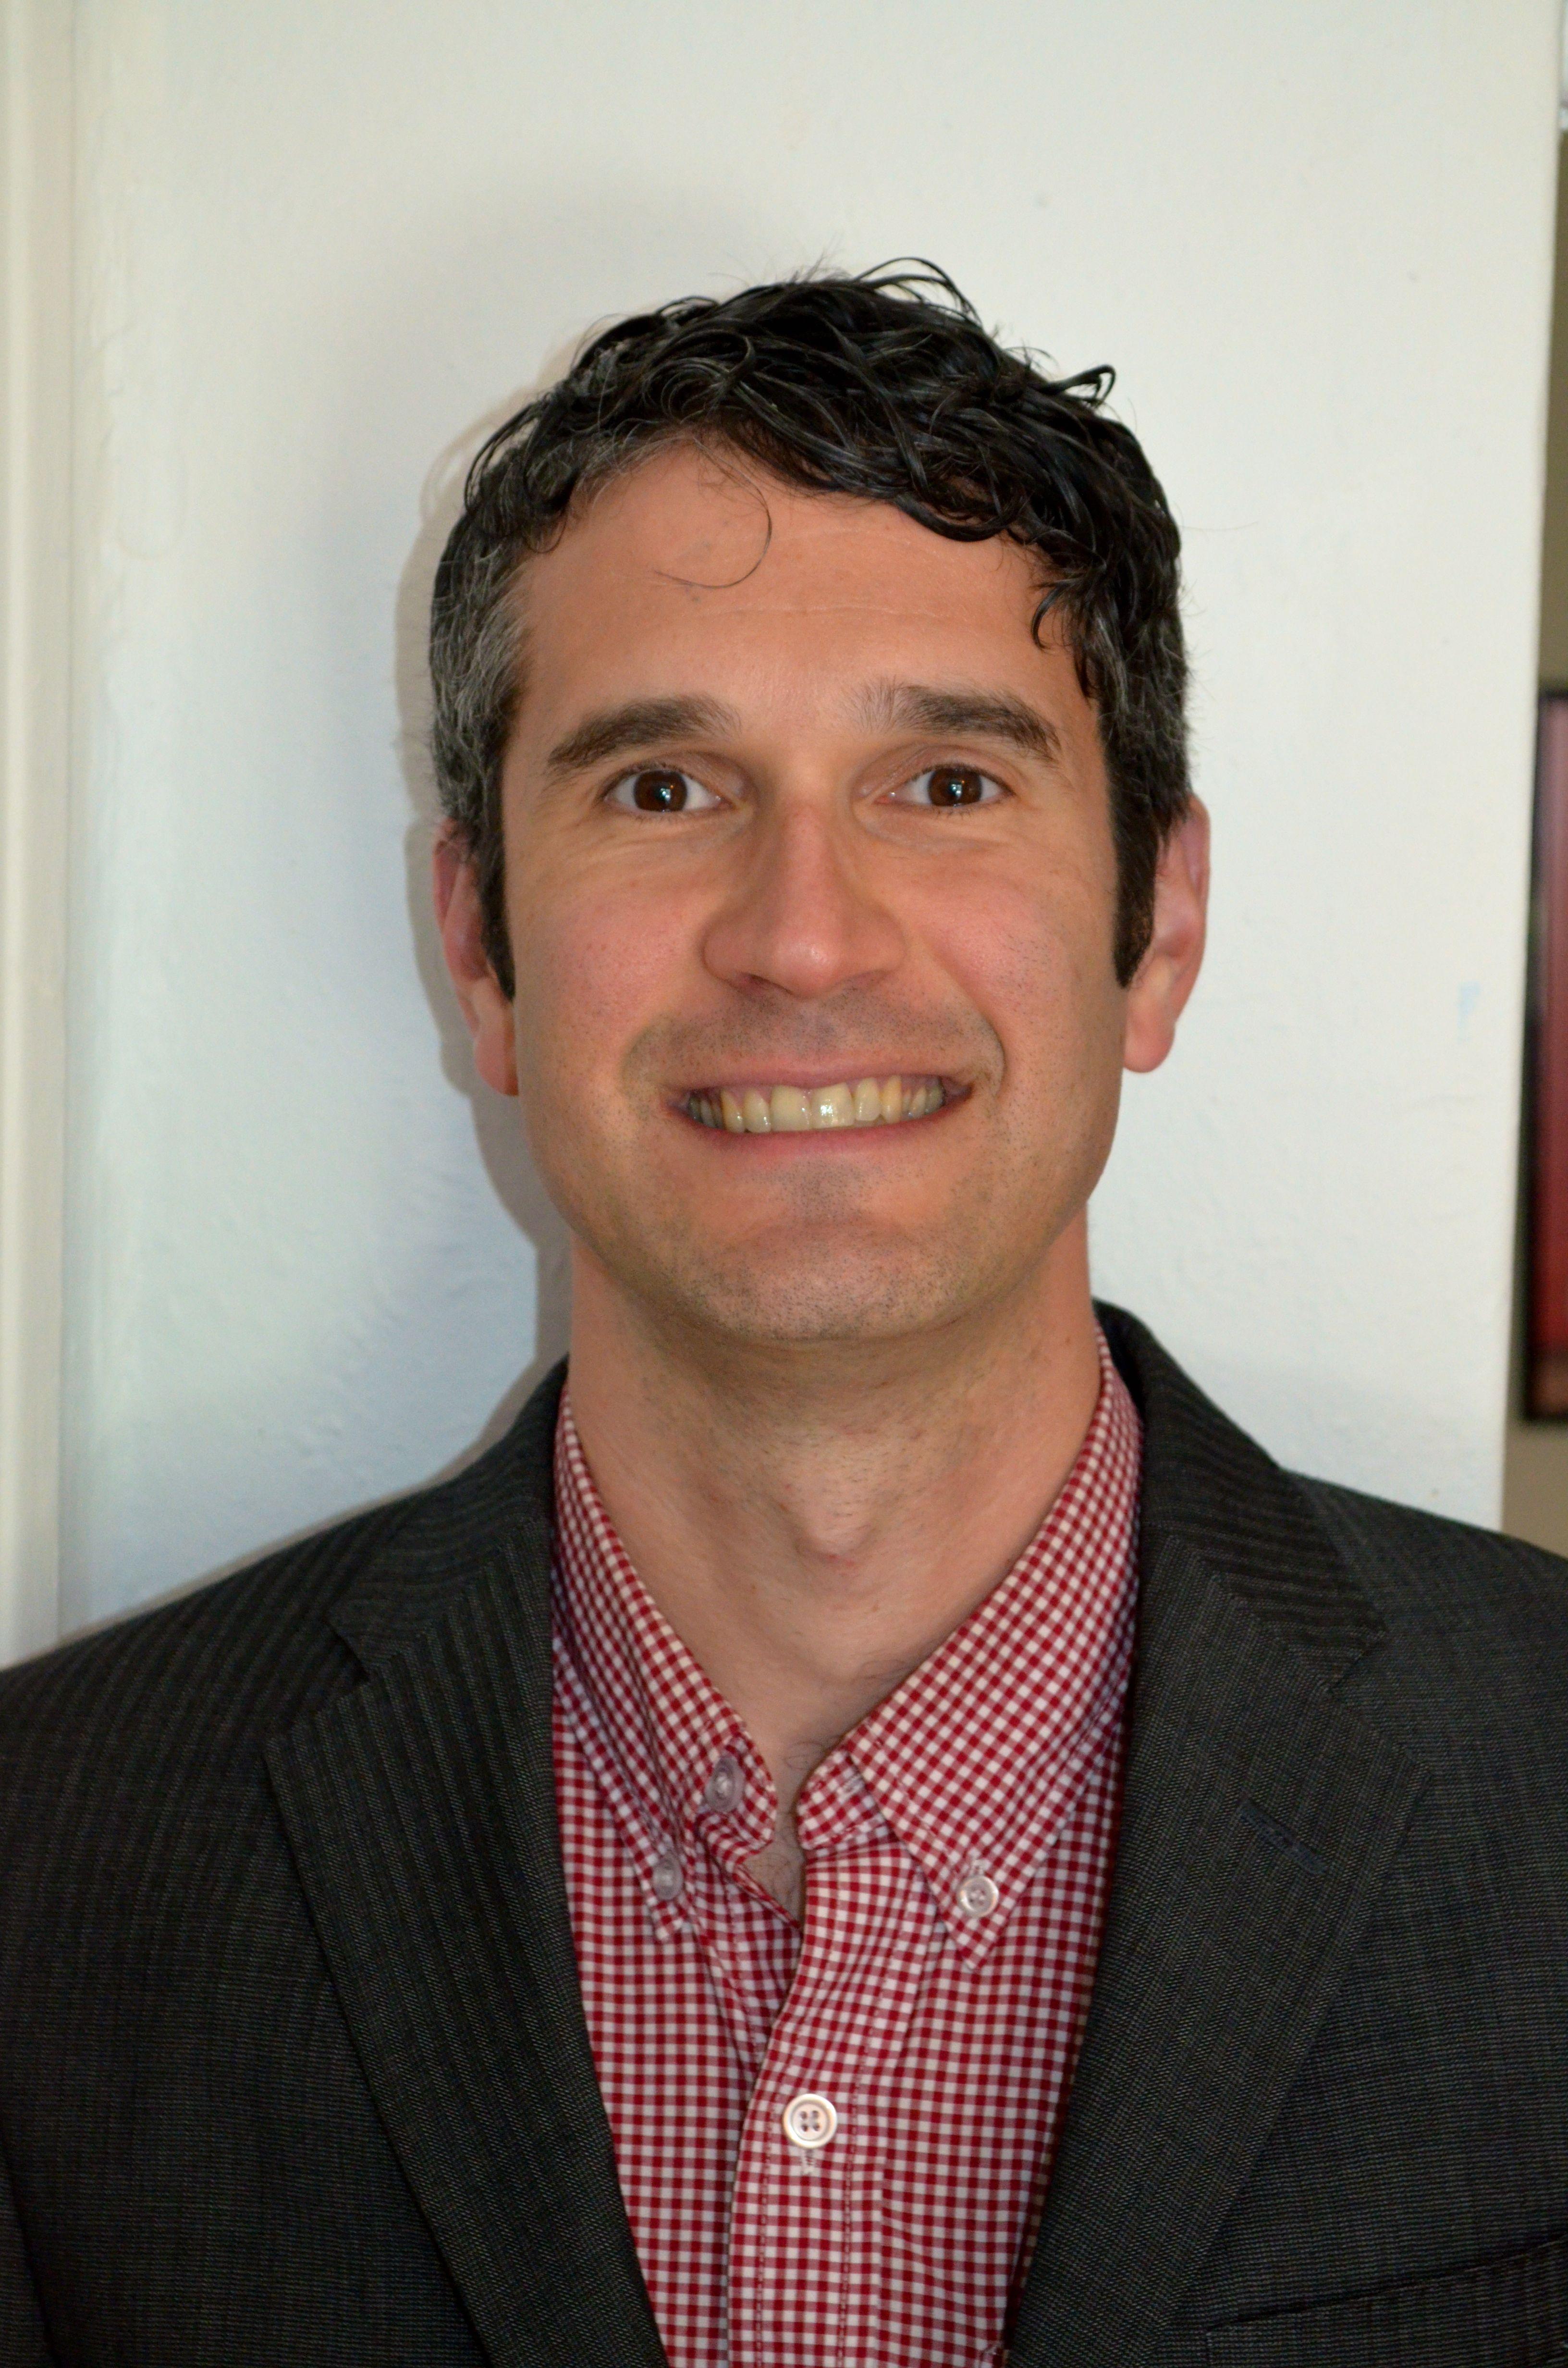 David DesBaillets